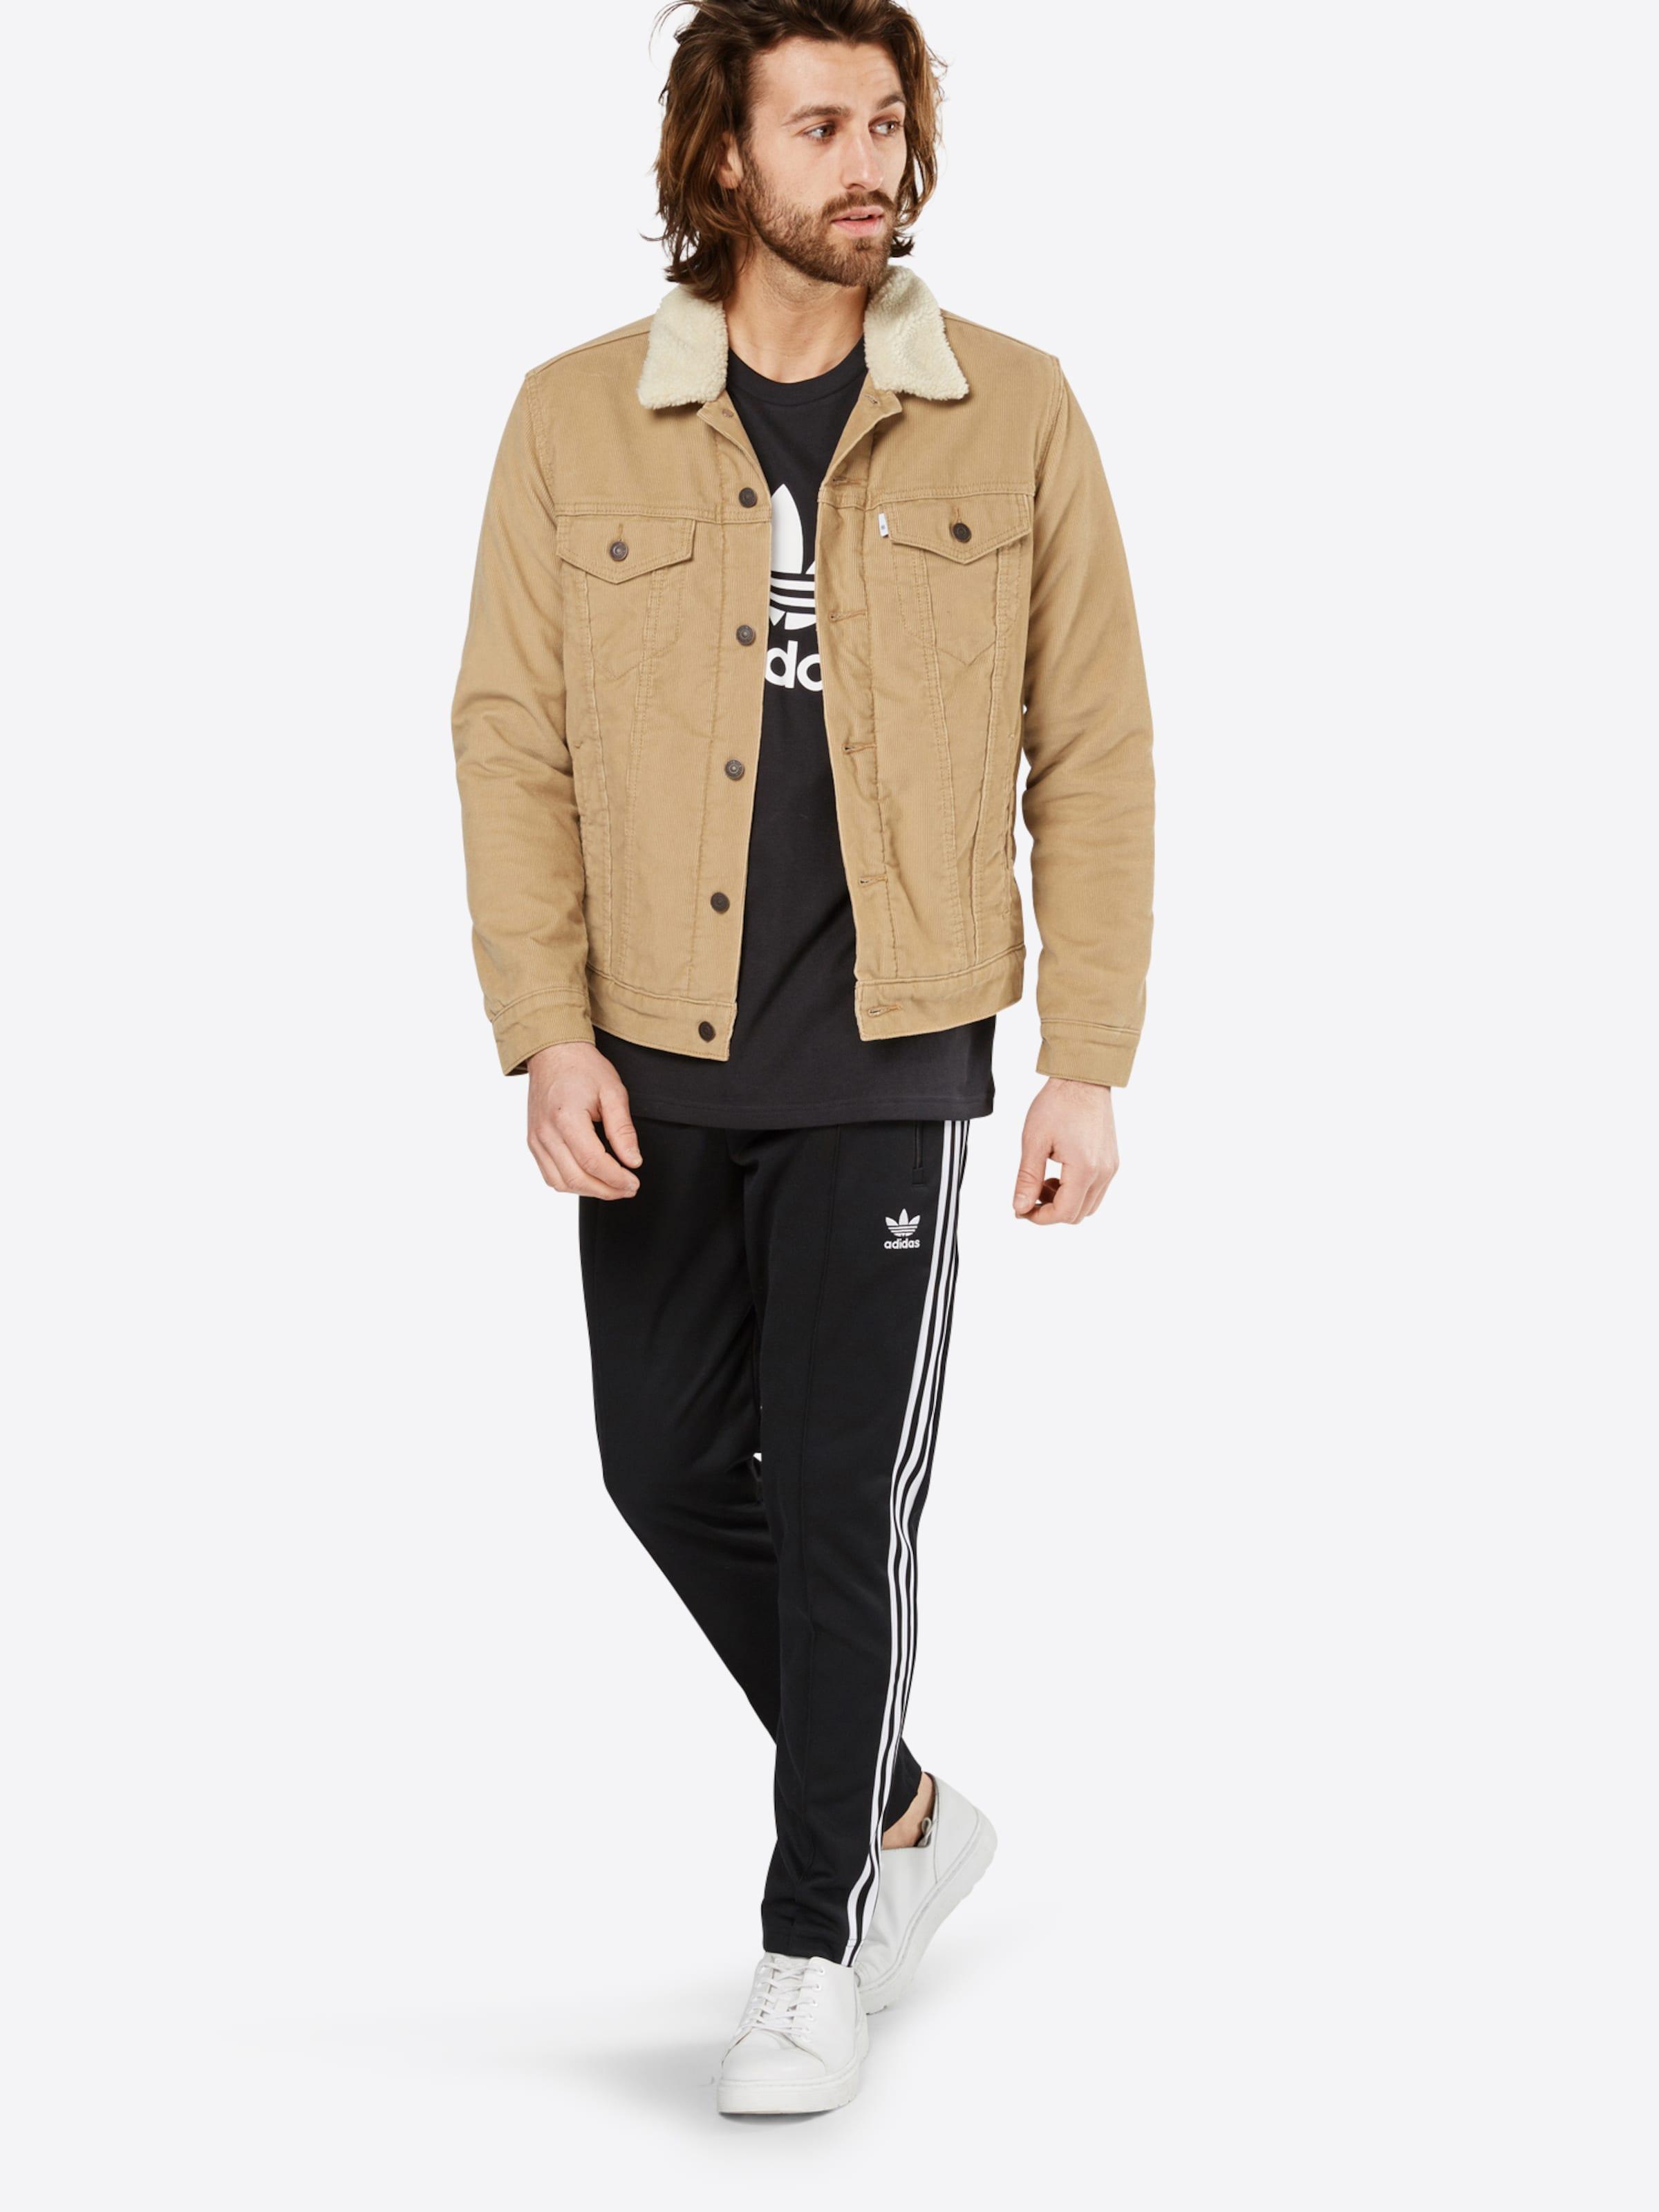 NoirBlanc En Originals T 'trefoil' shirt Adidas ZliTuOkwPX